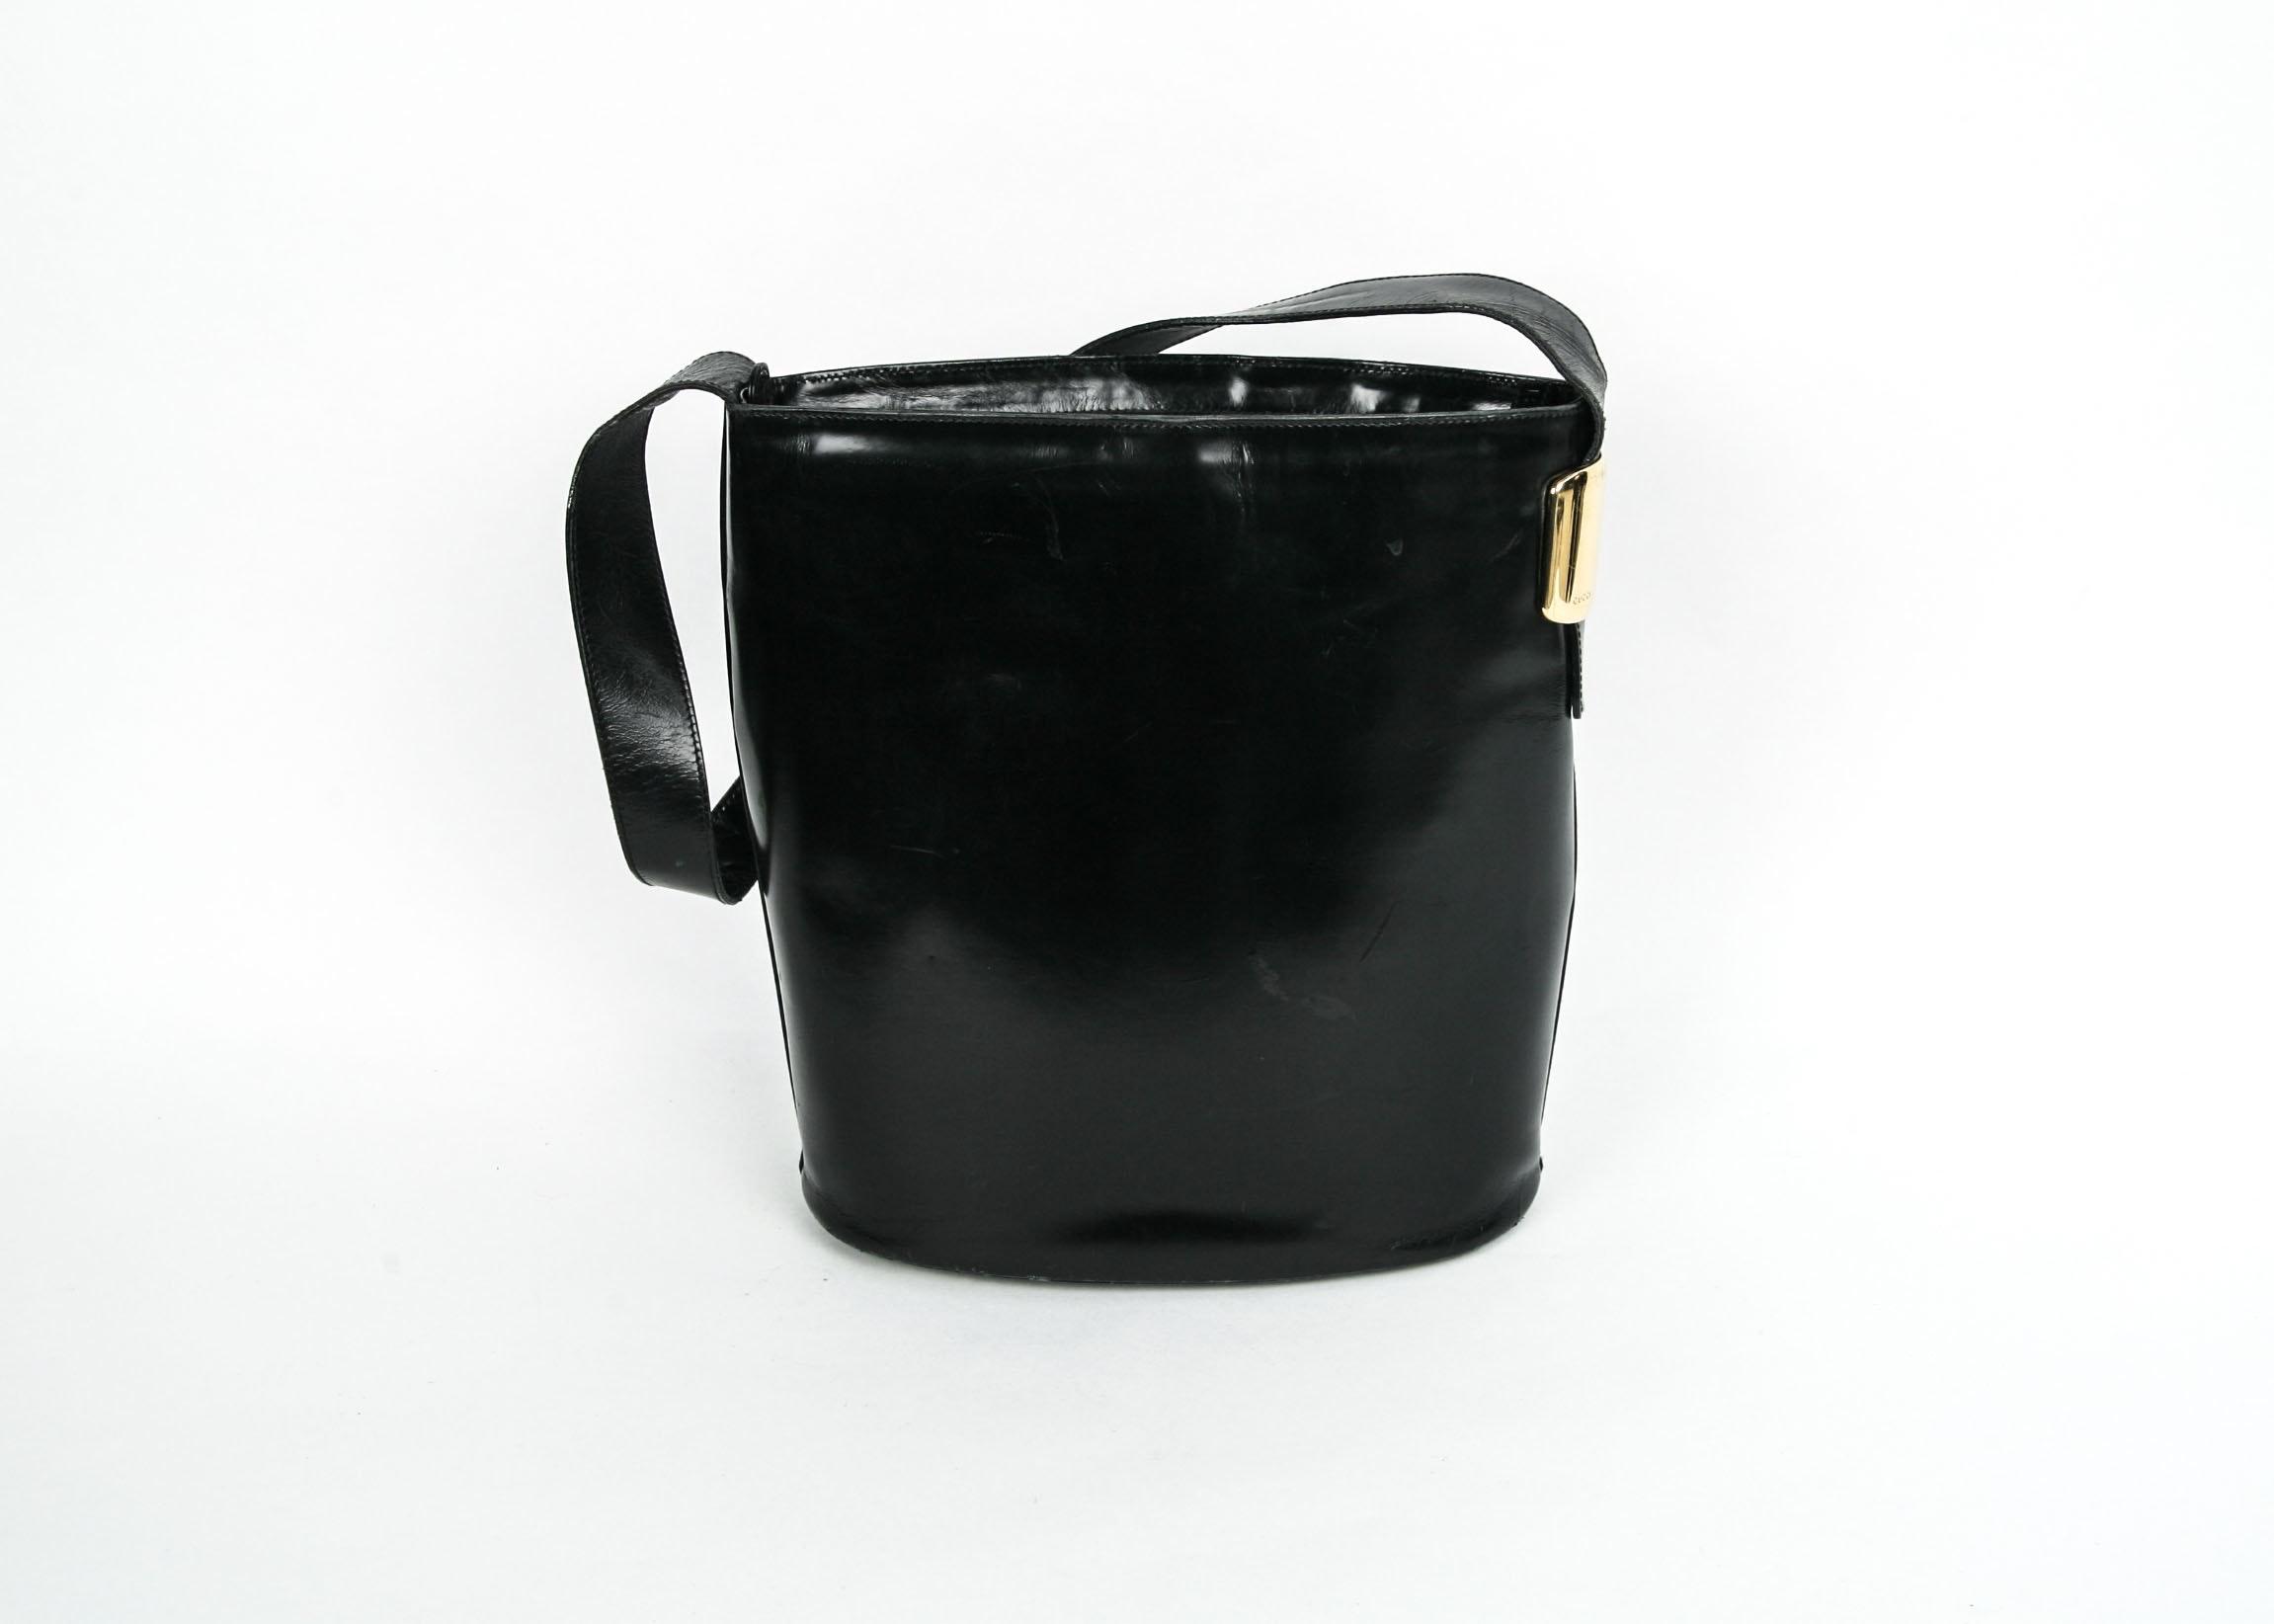 Vintage Gucci Black Leather Bucket Style Handbag